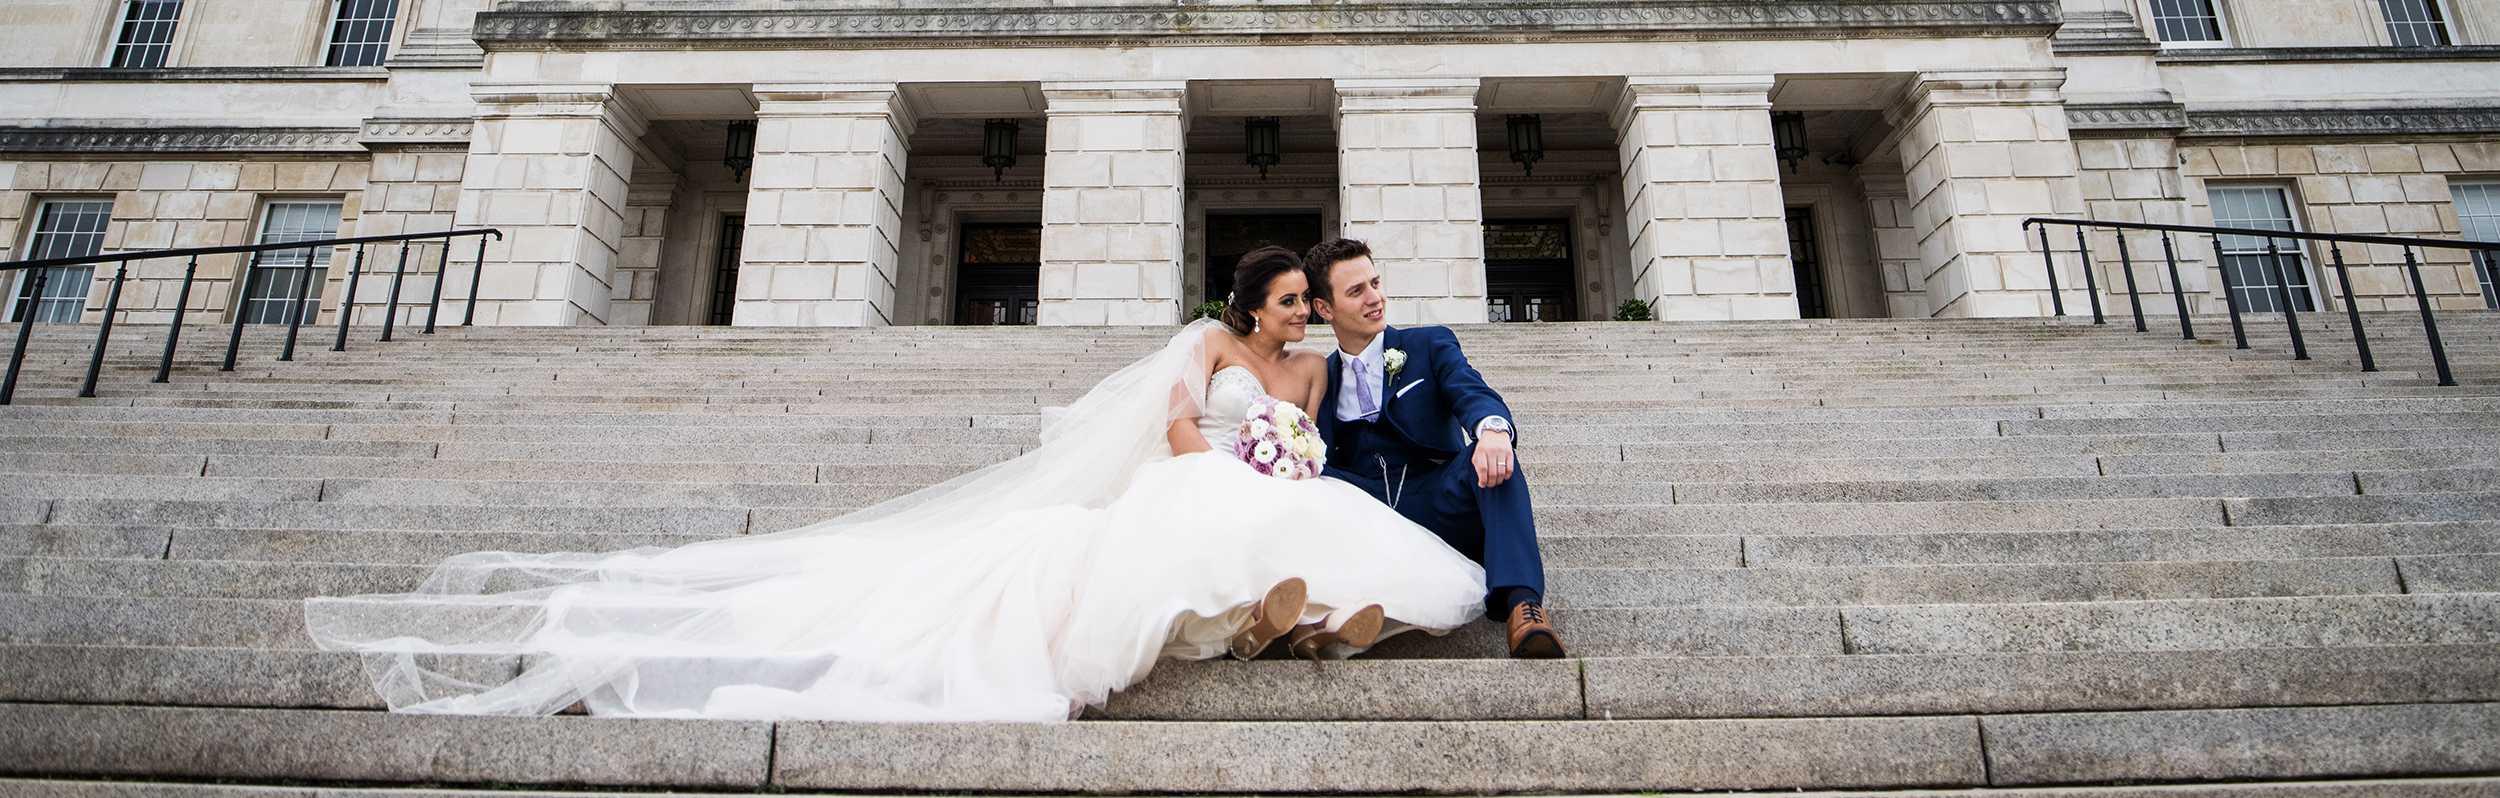 Weddings at Parliament Buildings, Belfast